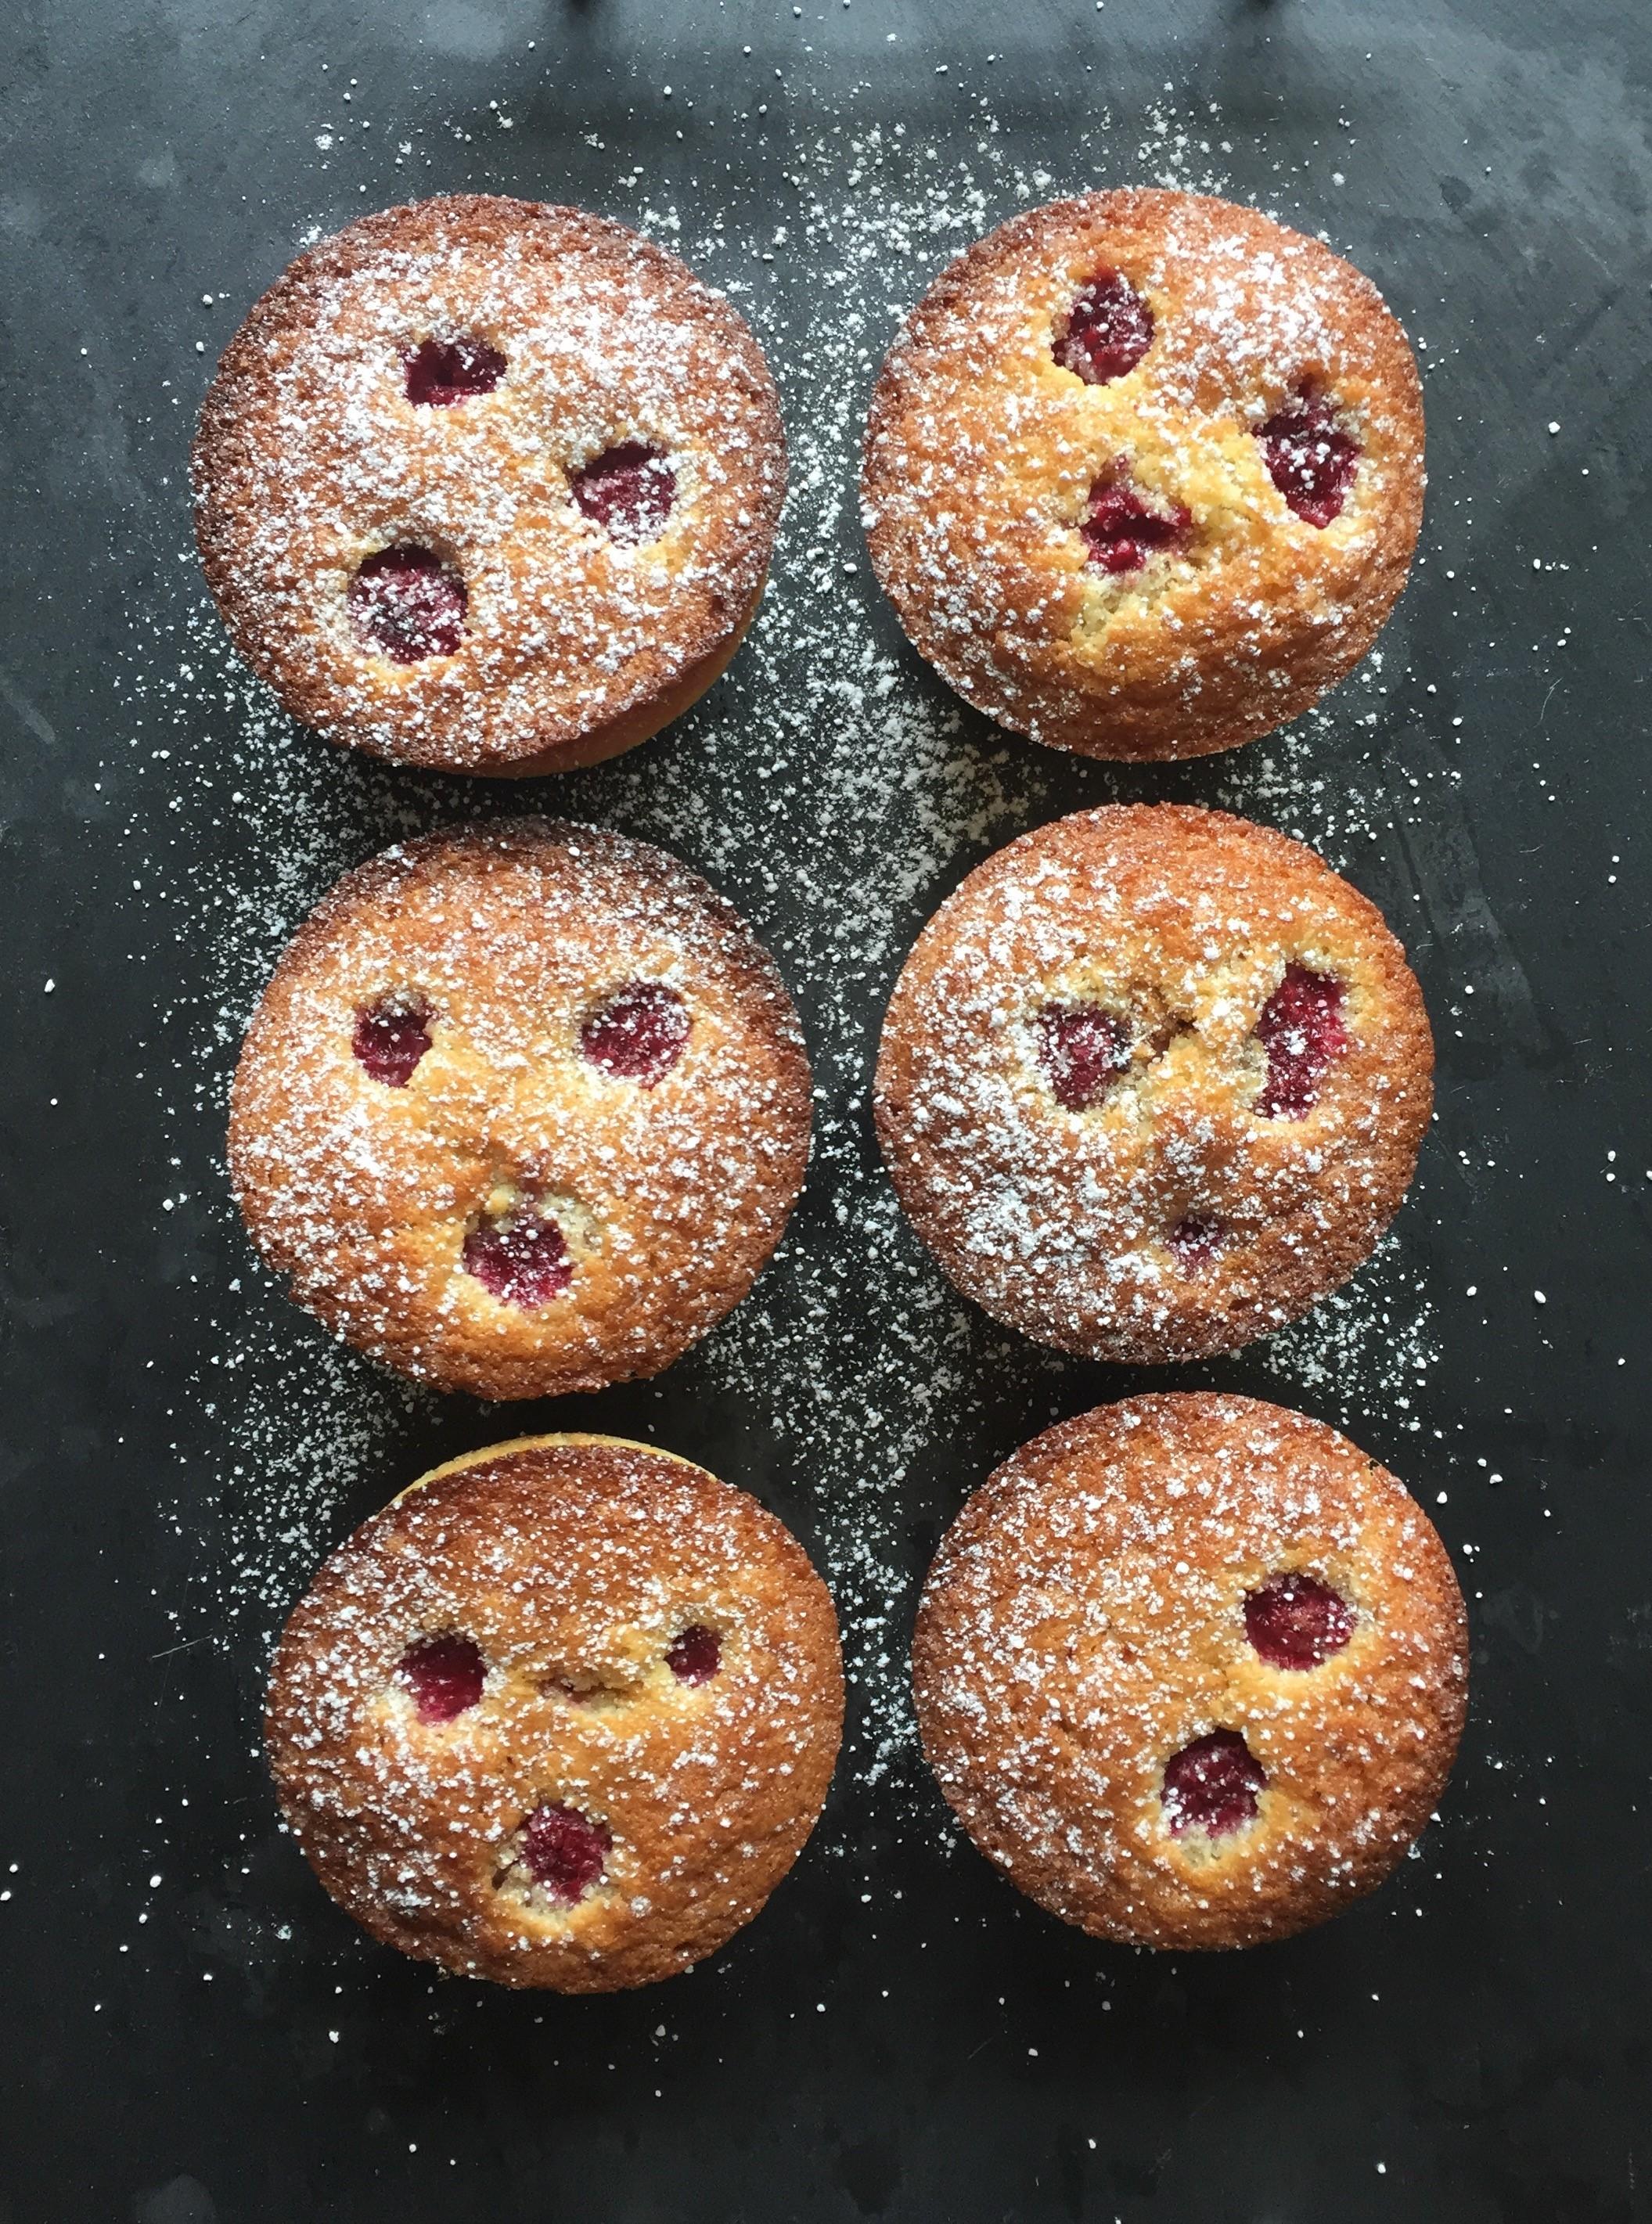 Raspberry & Almond Tarts